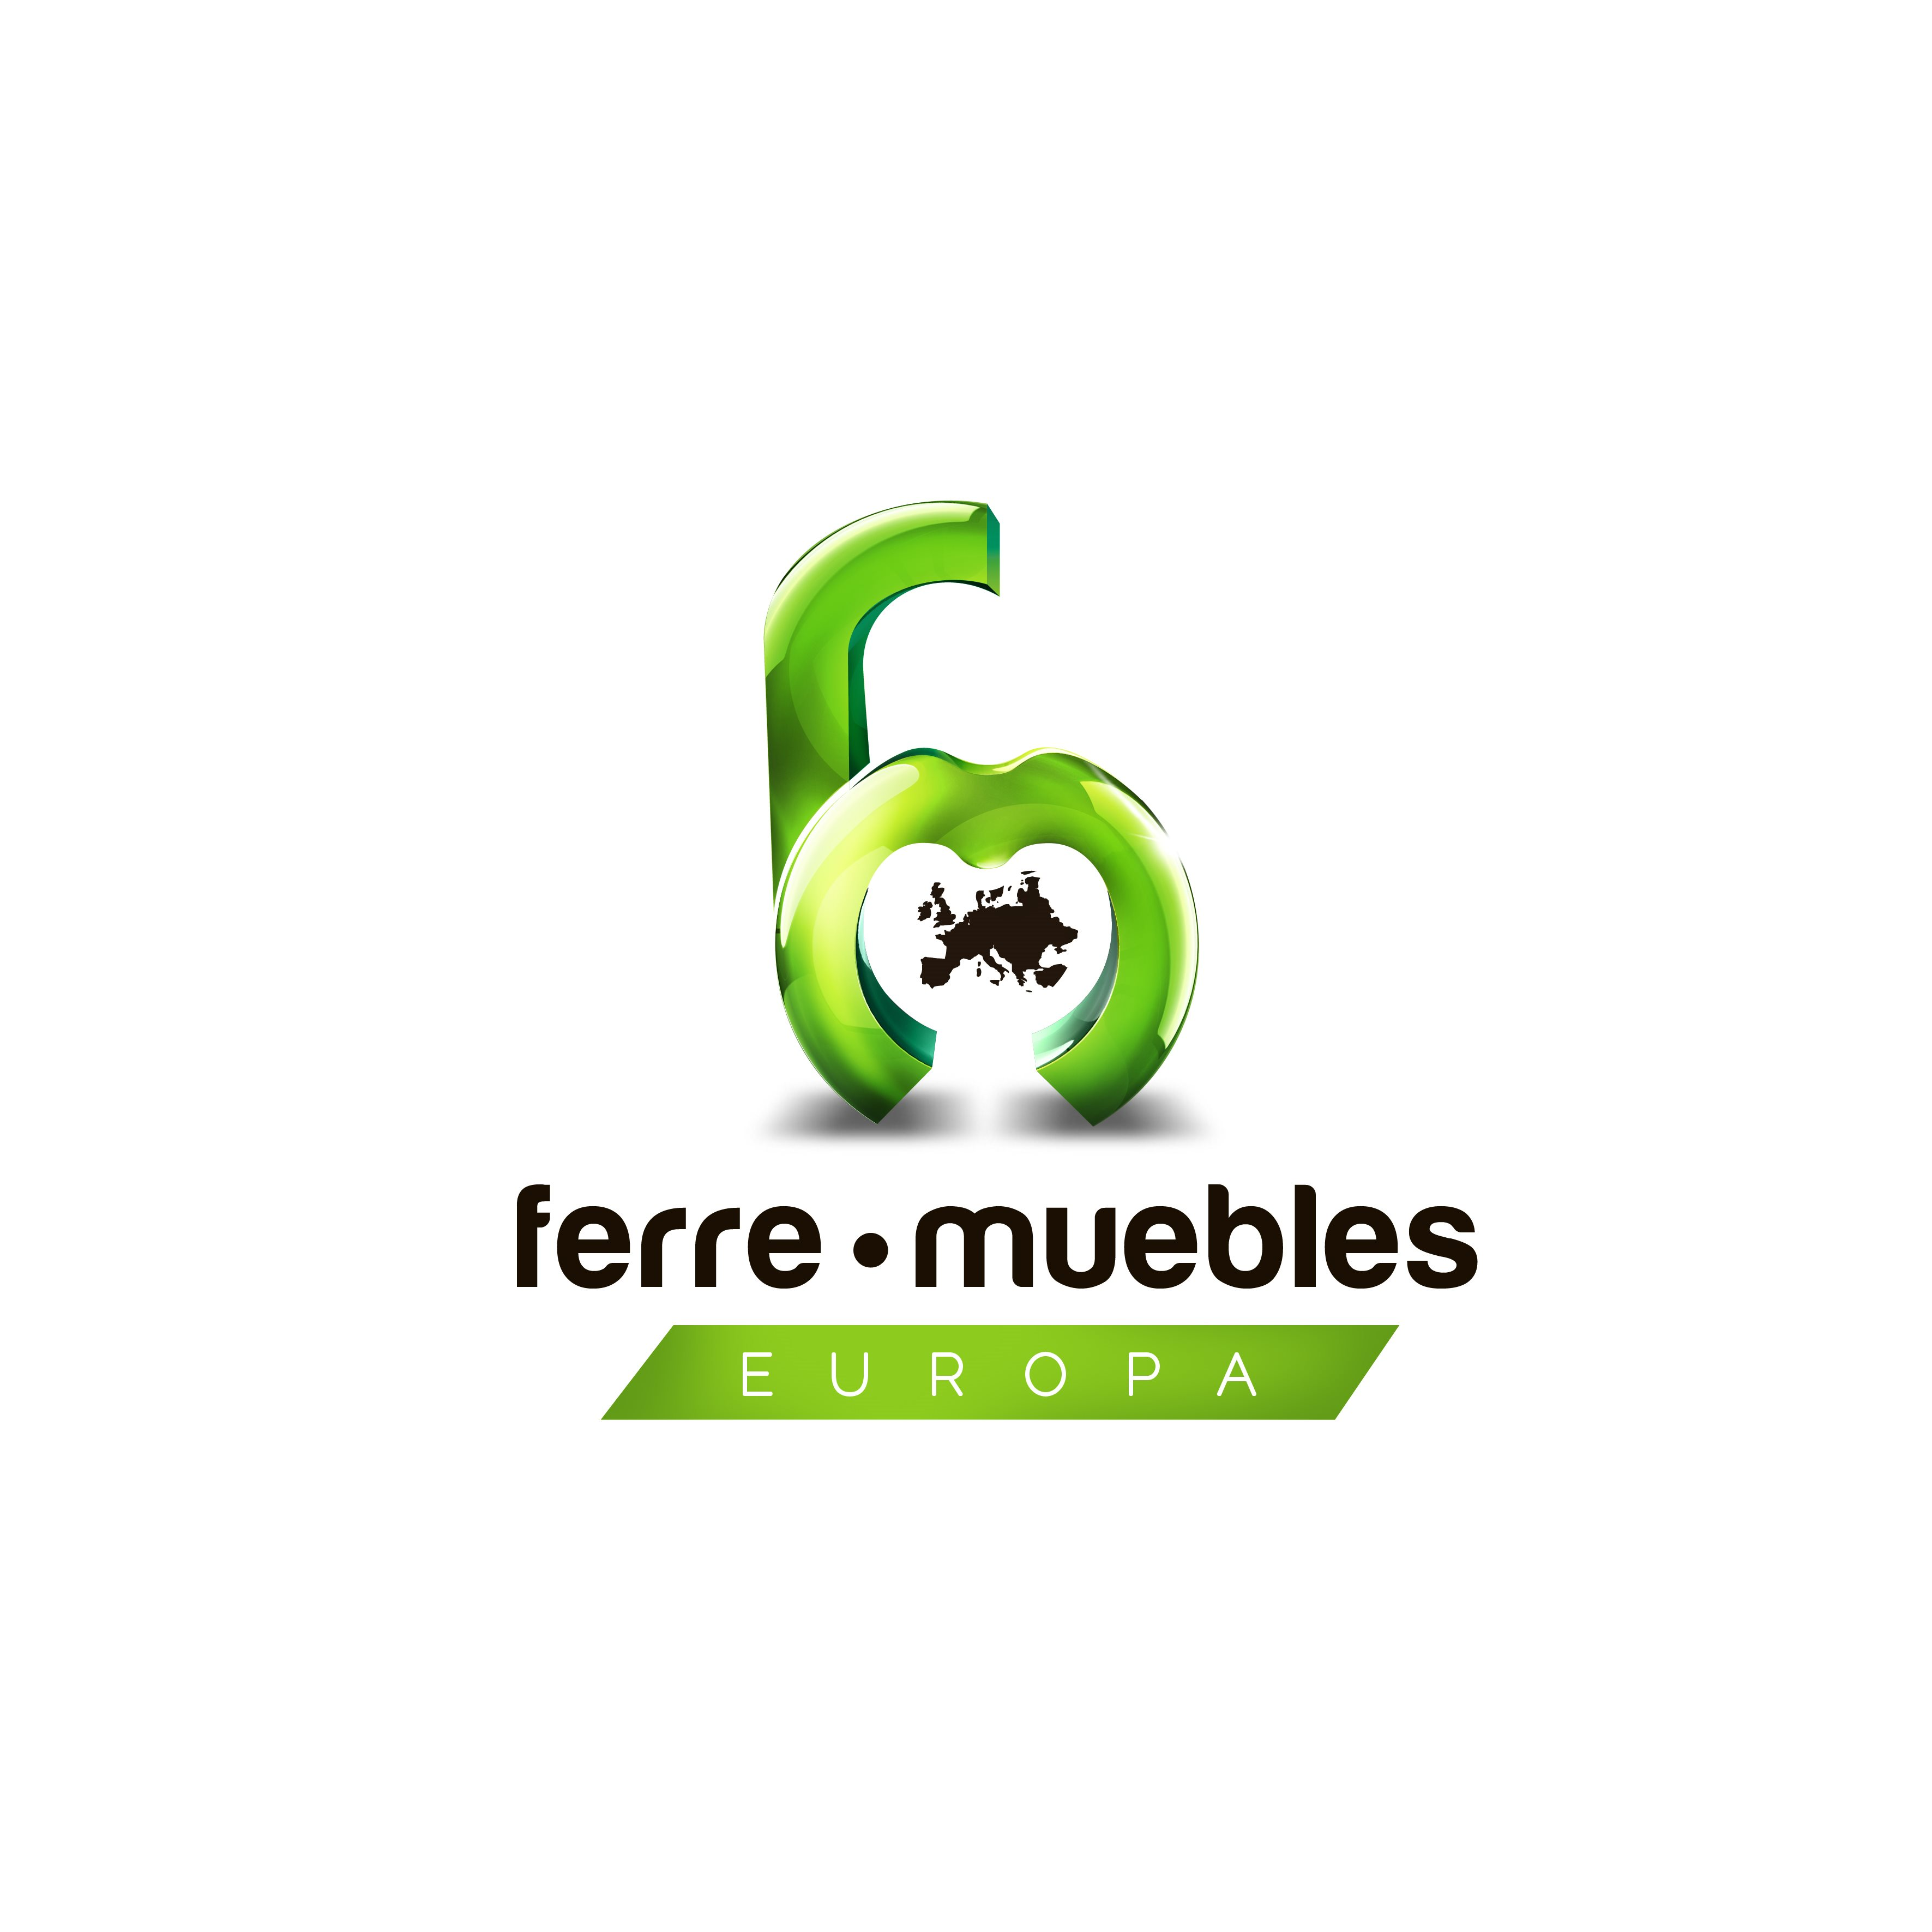 Ferre muebles europa c a for Europa muebles